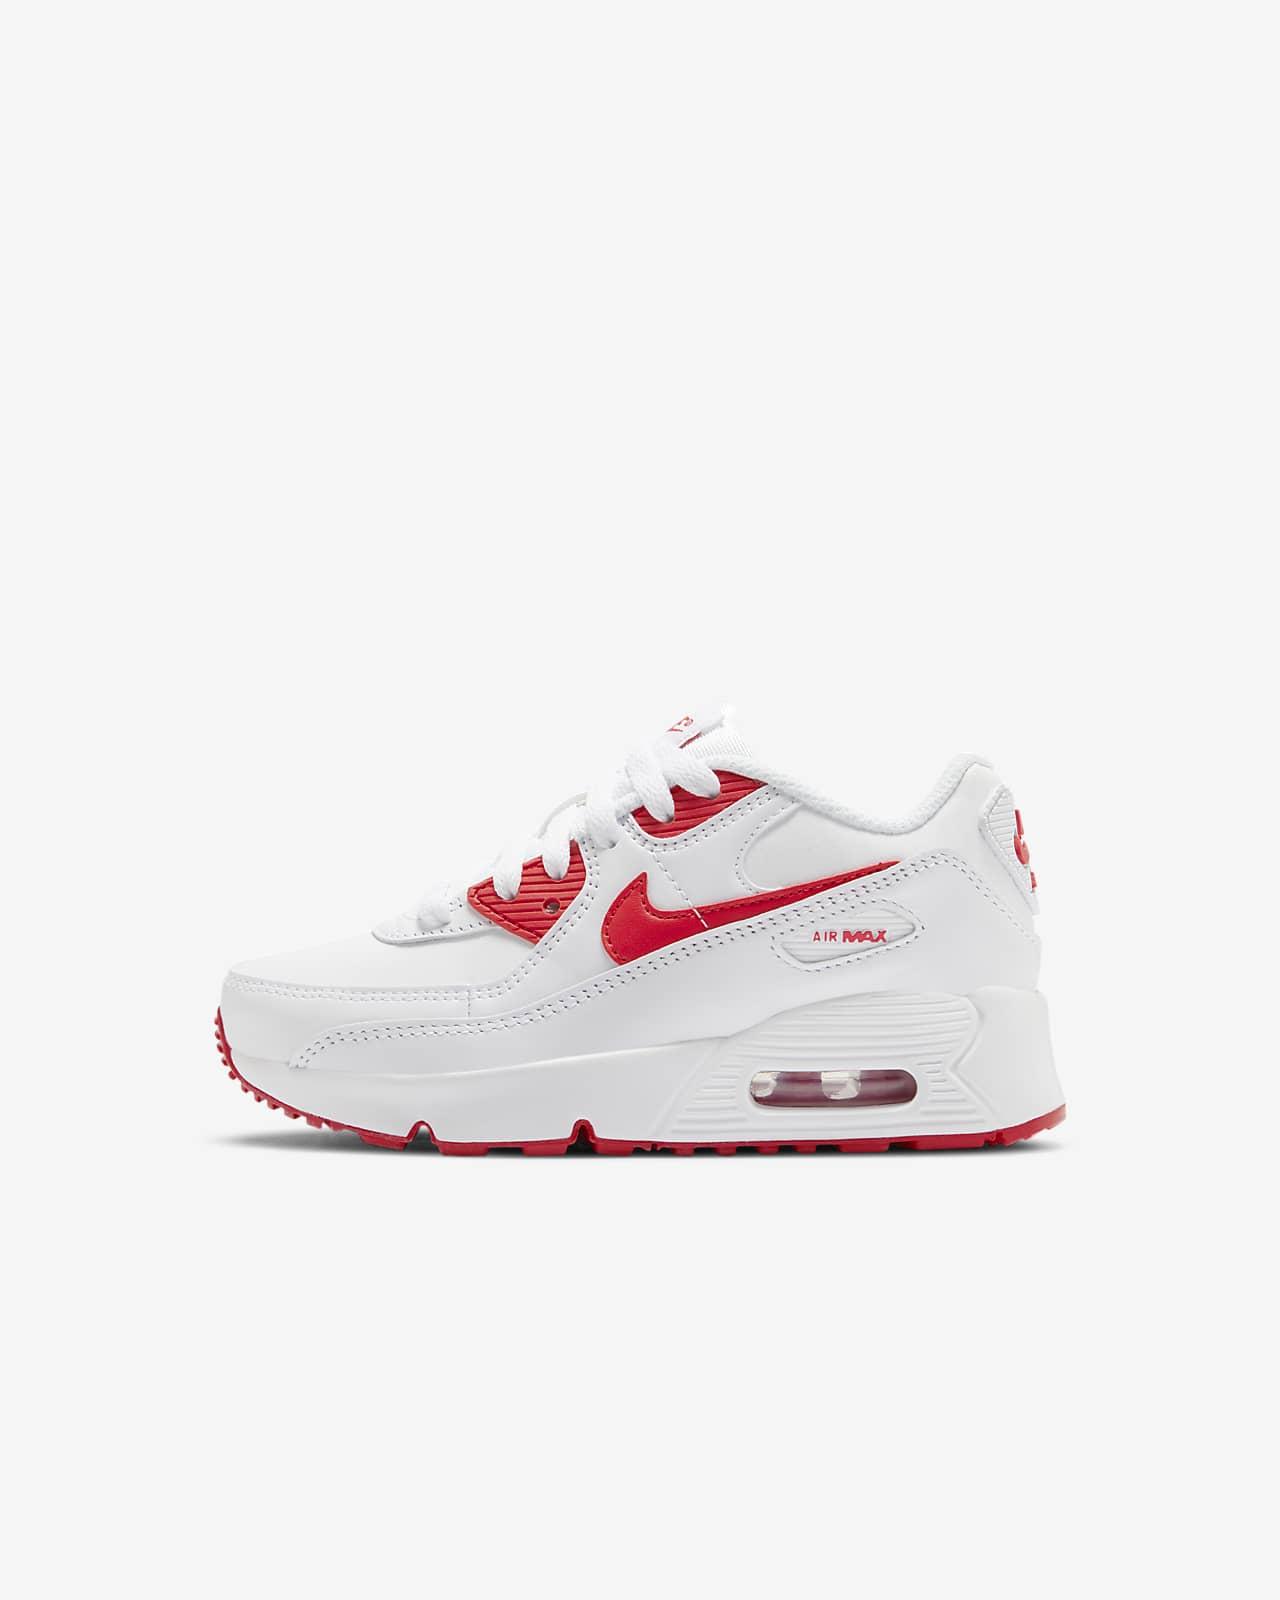 Nike Air Max 90 cipő kisebb gyerekeknek